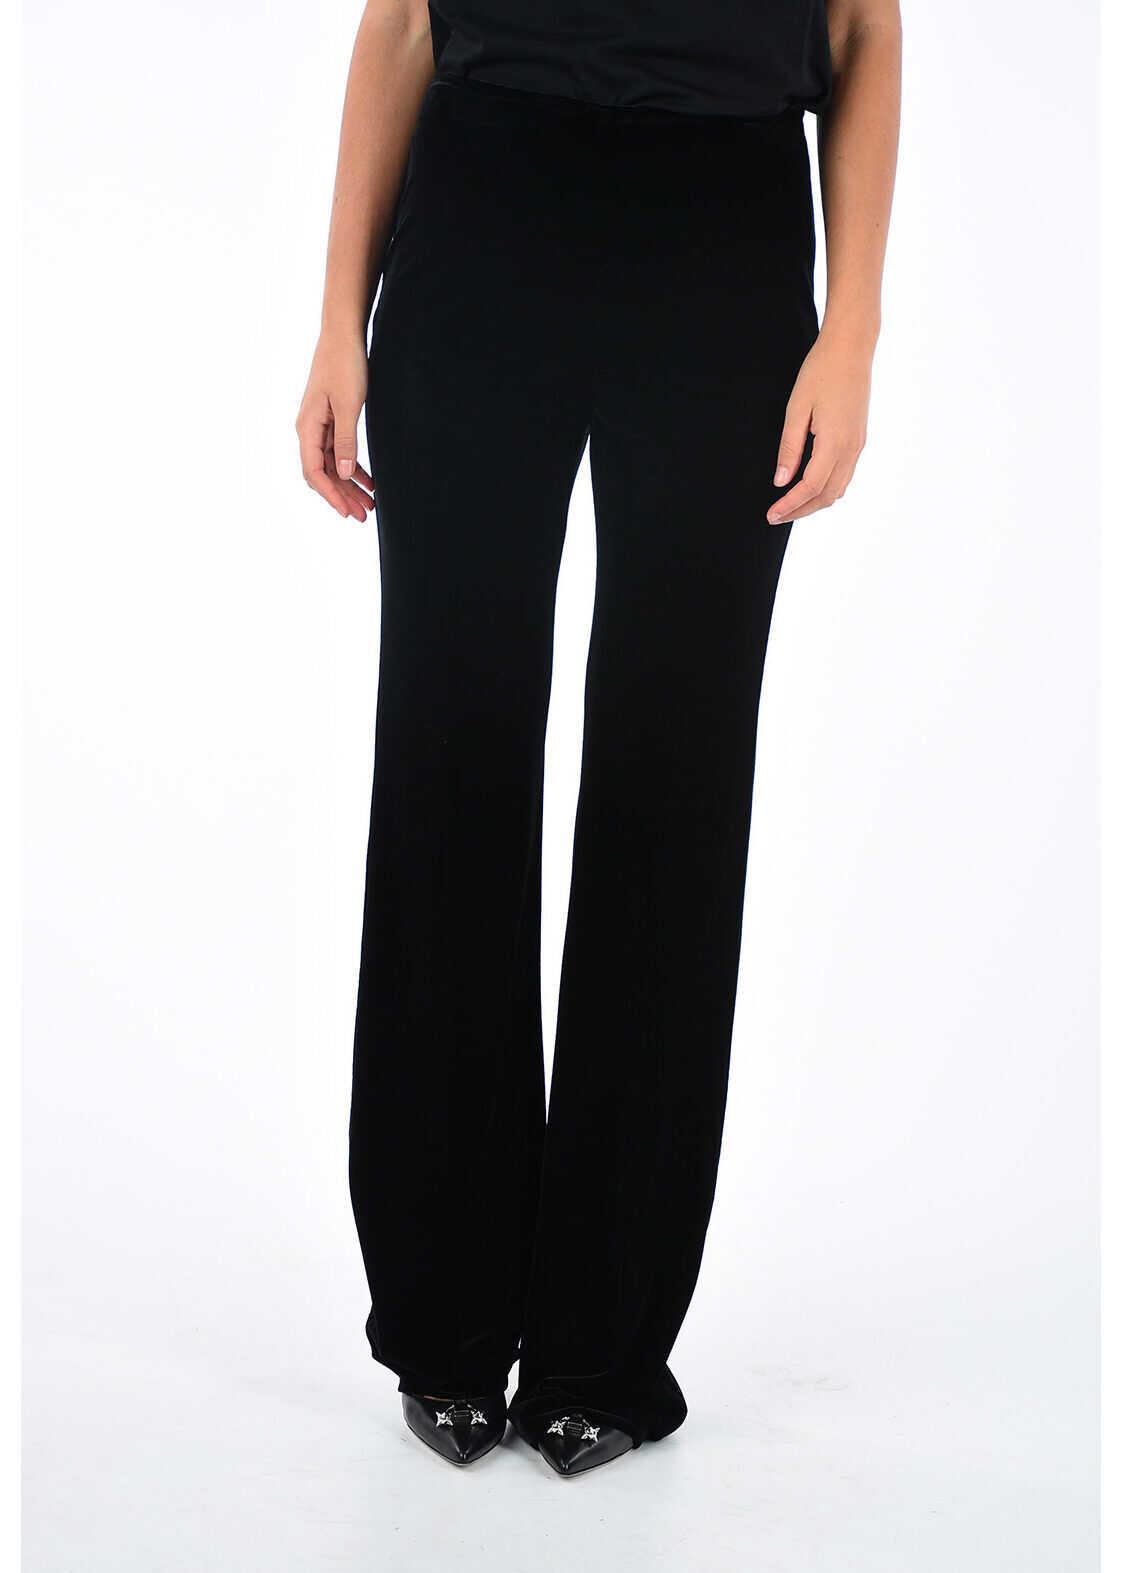 Miu Miu Velvet Pants BLACK